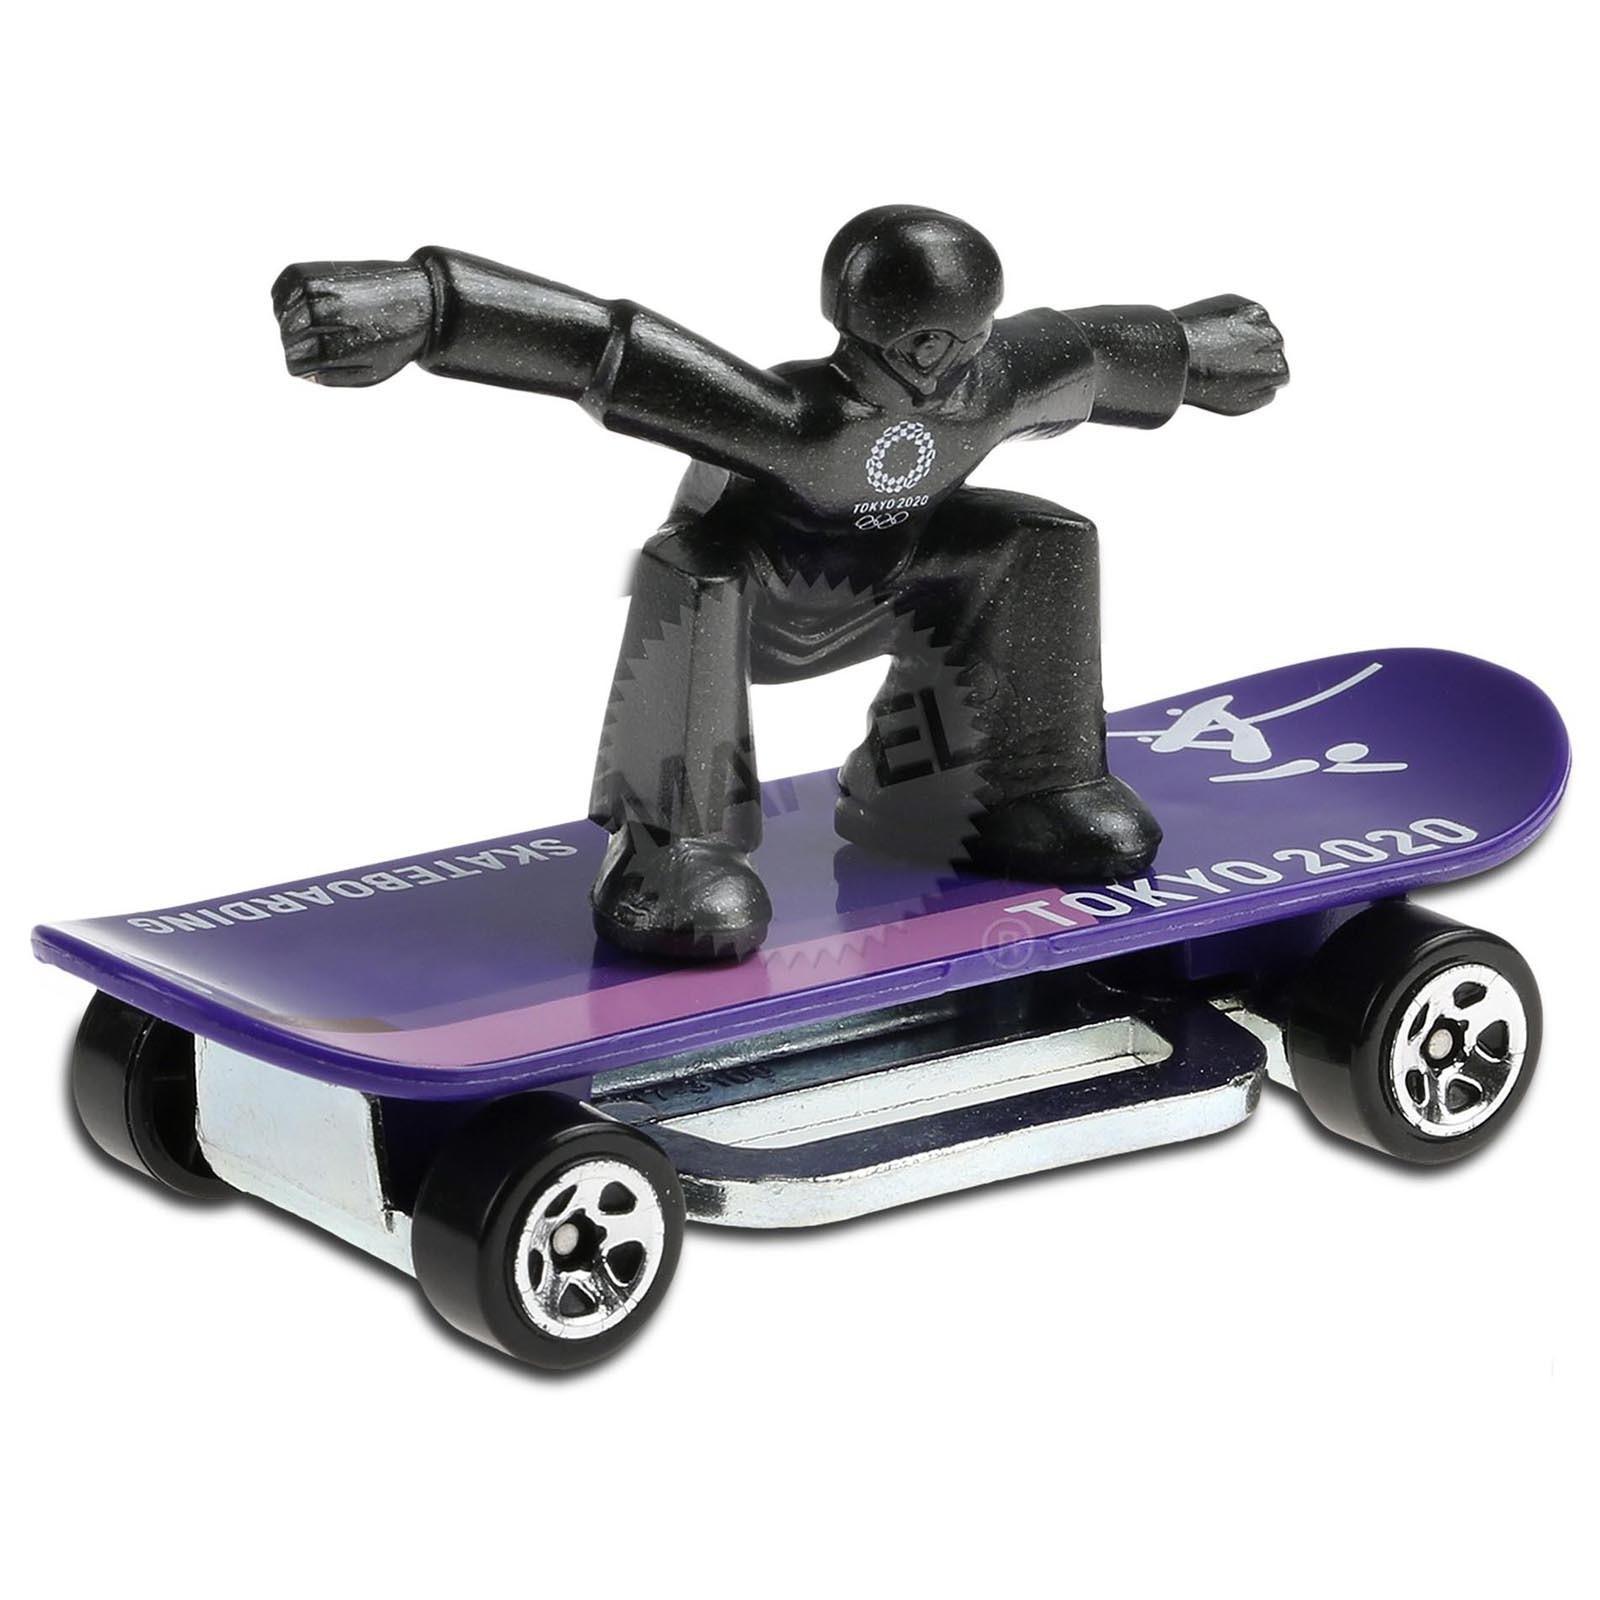 Carrinho Hot Wheels Skate Grom (QMFP4) Olympic Games Tokyo 2020